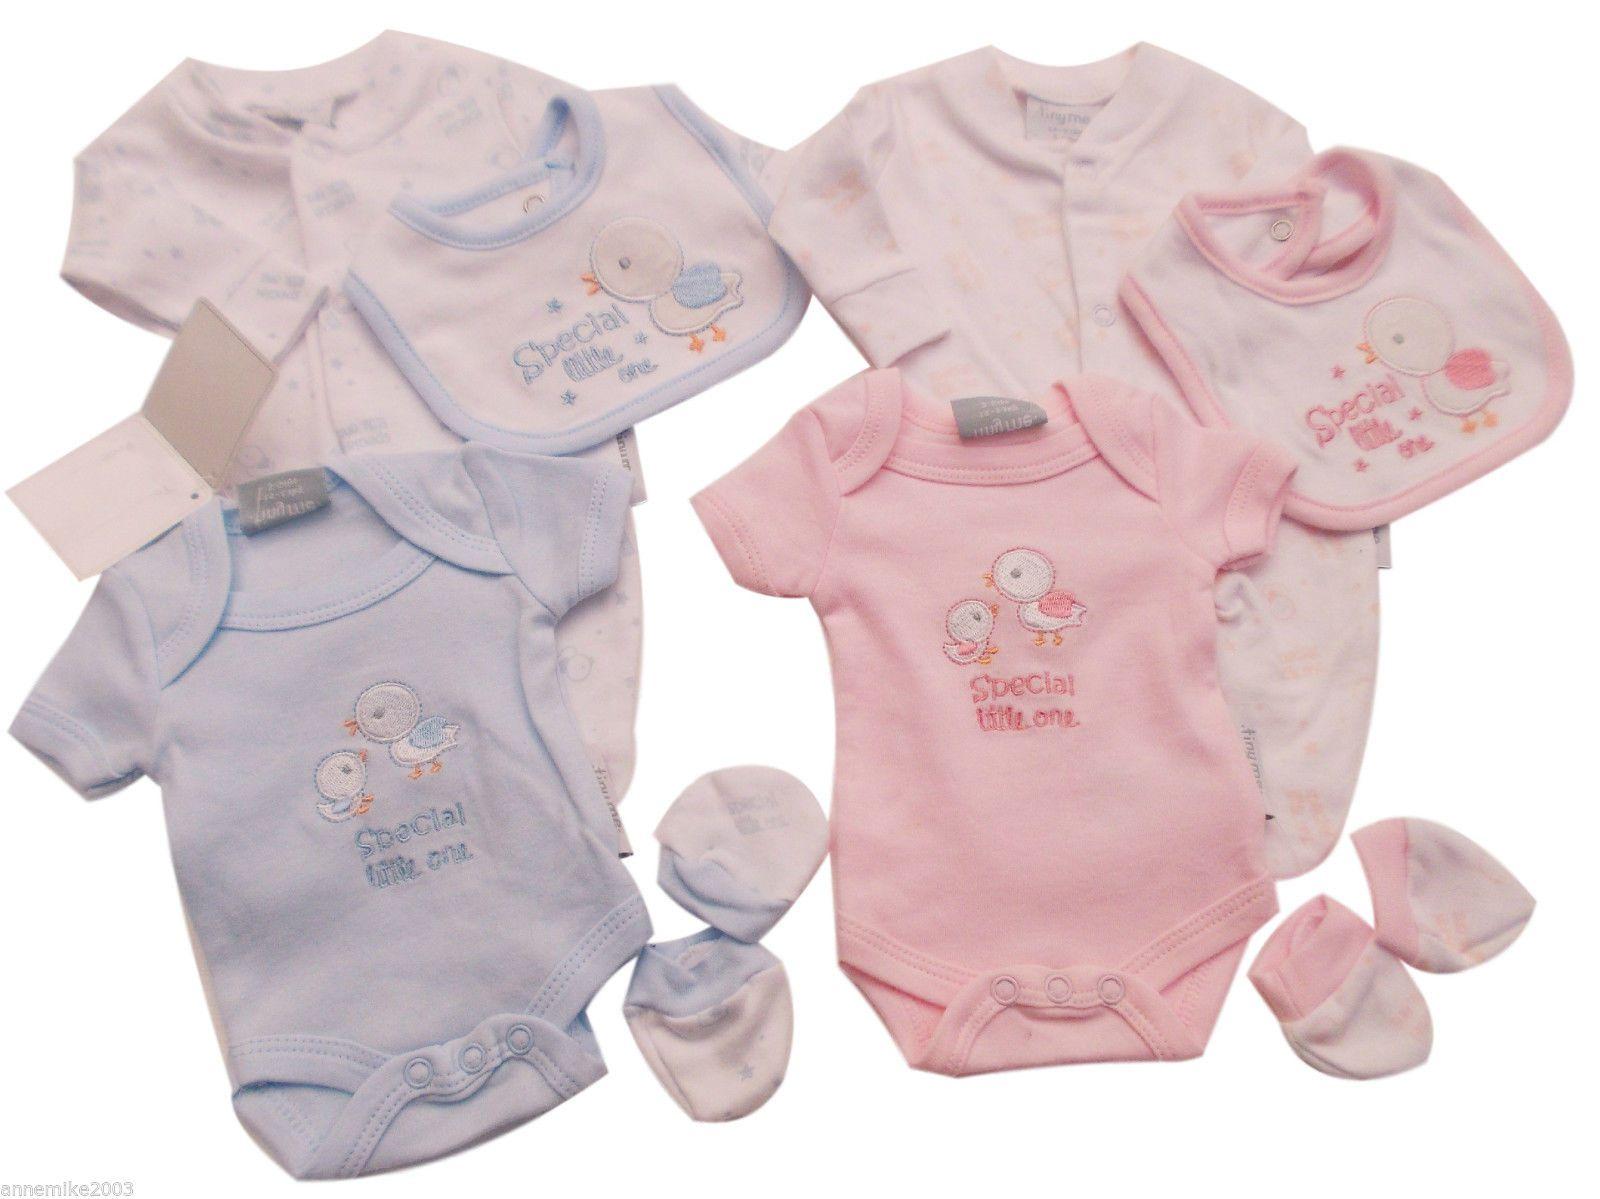 6503620a0 BNWT Baby reborn Premature Preemie Baby Boys Girls Clothes 4 Piece ...